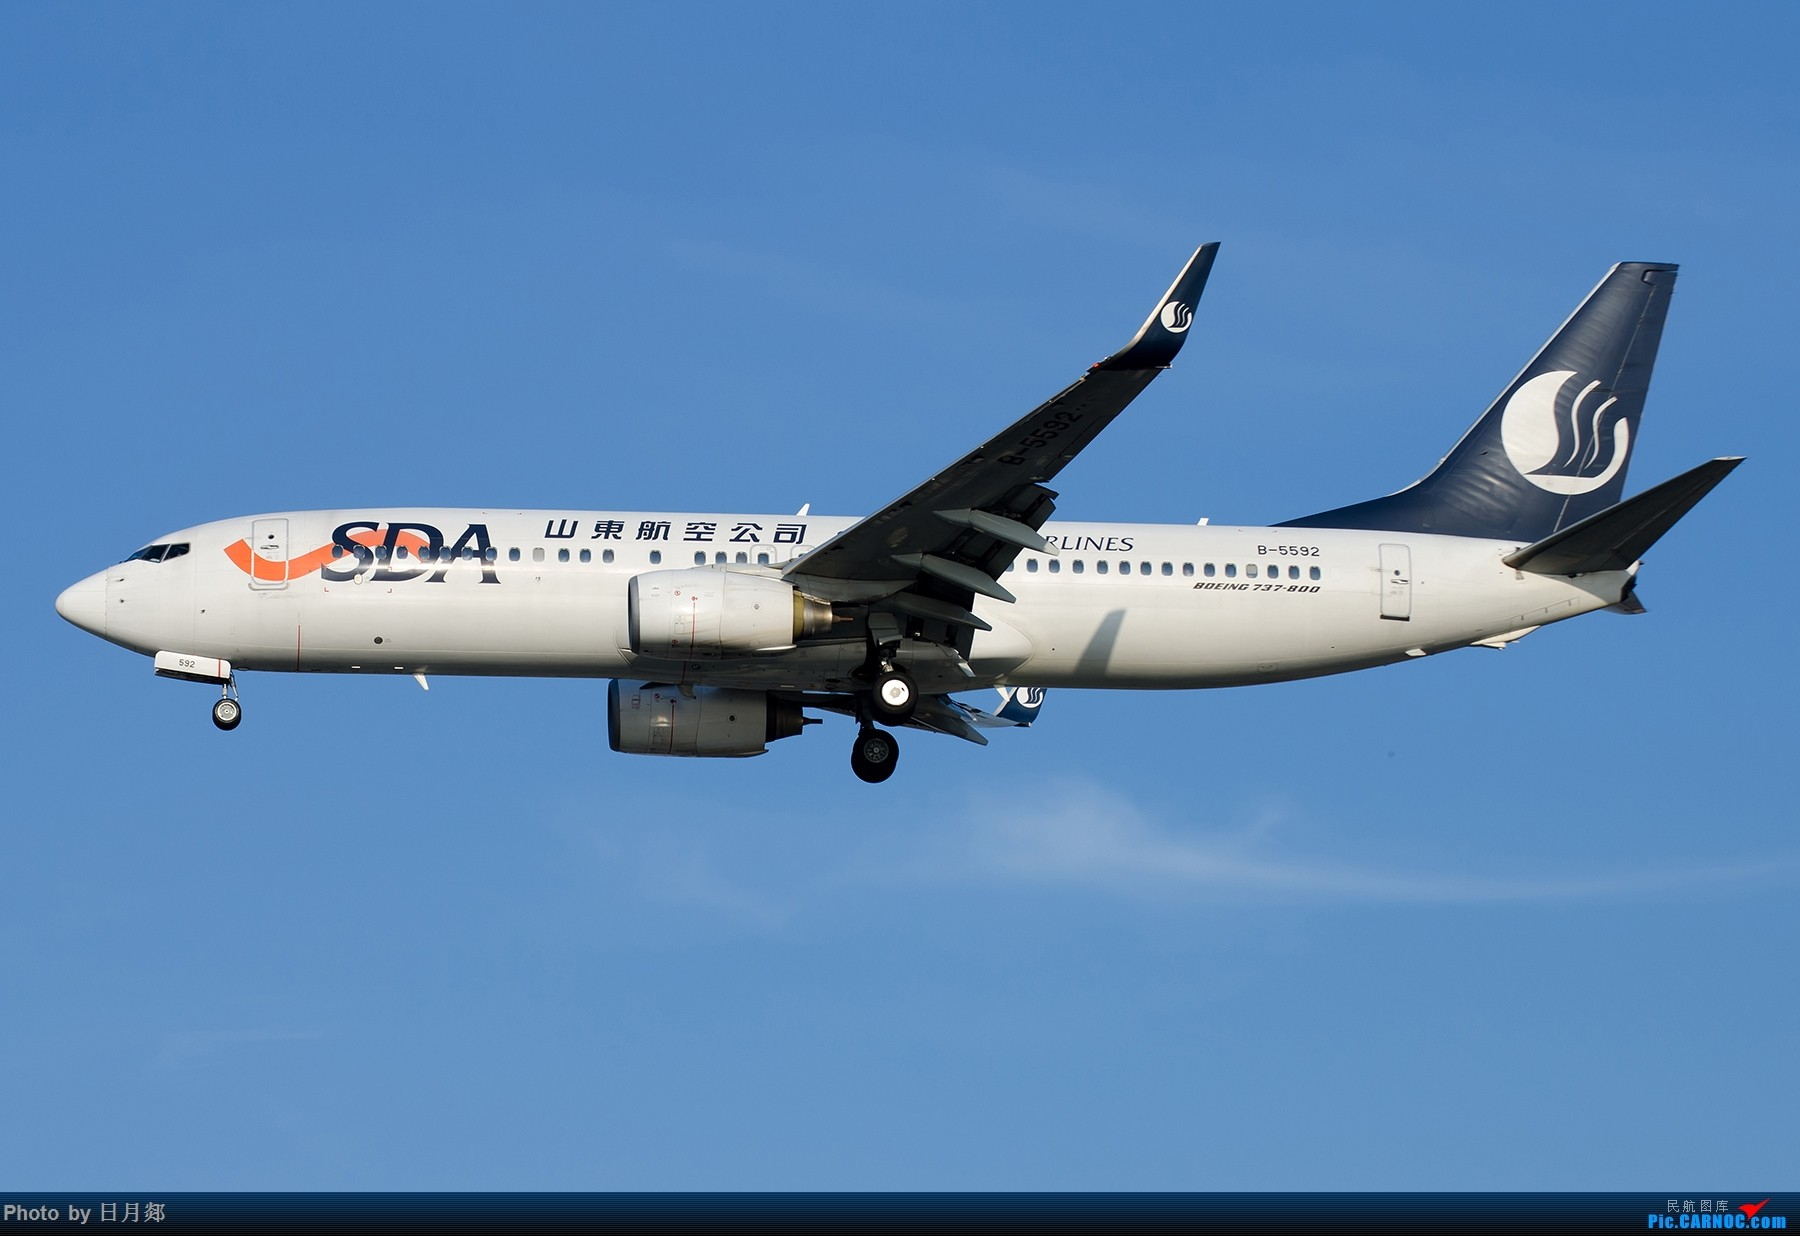 Re:[原创]【SHA拍机*1800大图】轻度污染来临前宝贵的蓝天,且拍且珍惜 BOEING 737-800 B-5592 中国上海虹桥国际机场